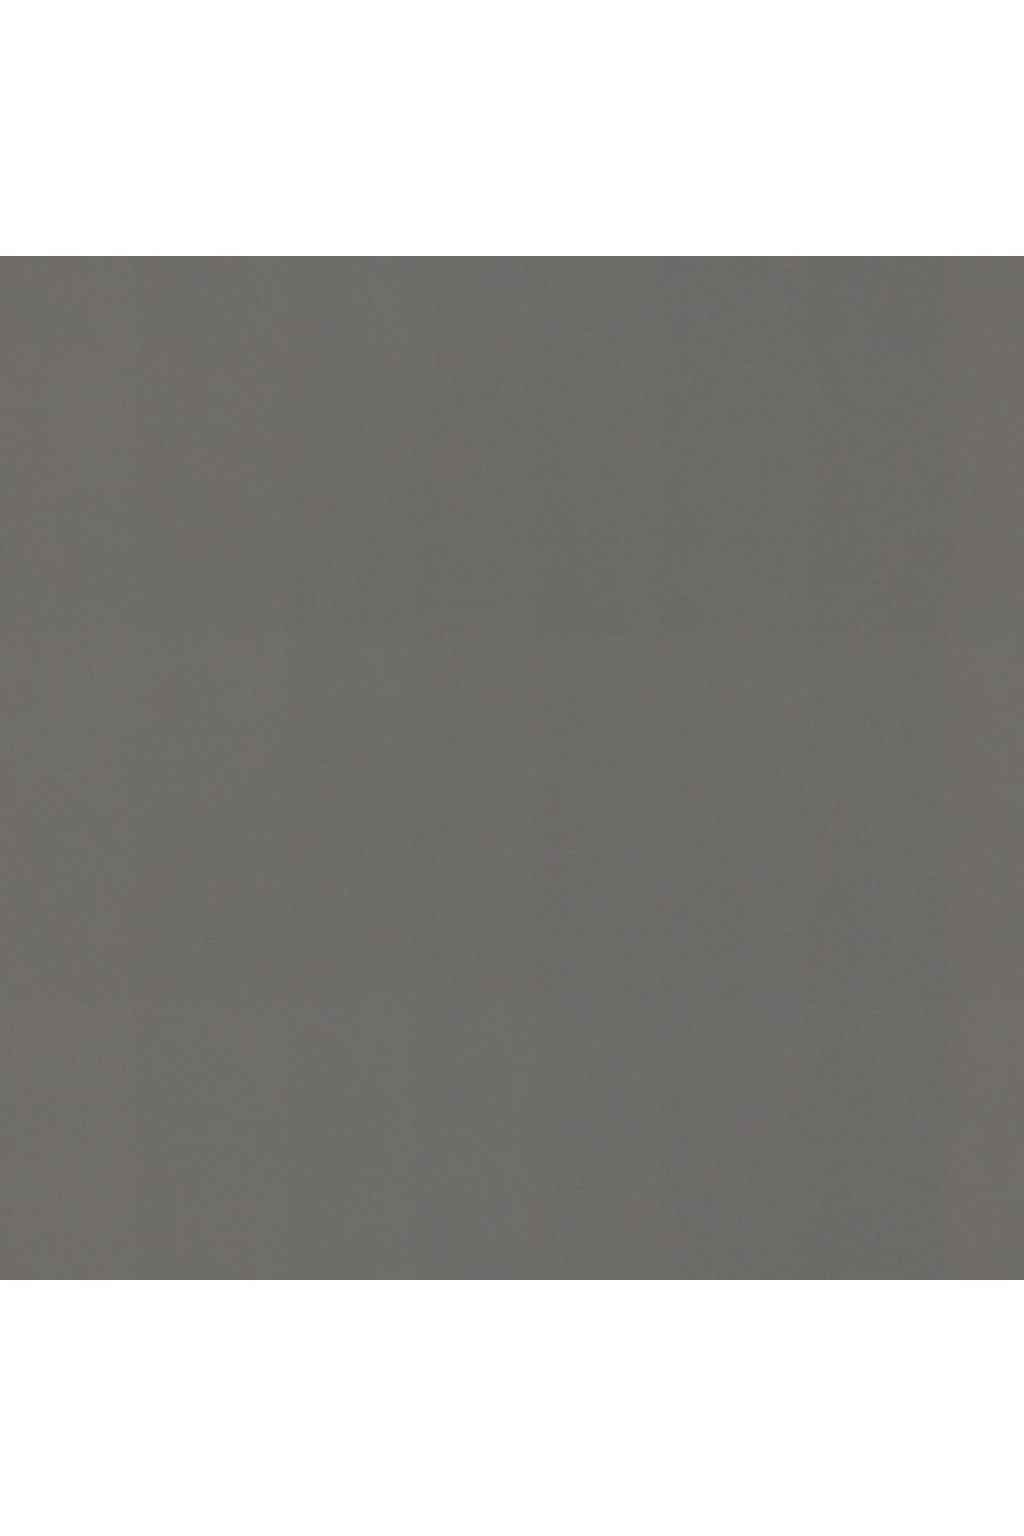 Zadní panel Dark Grey 16mm